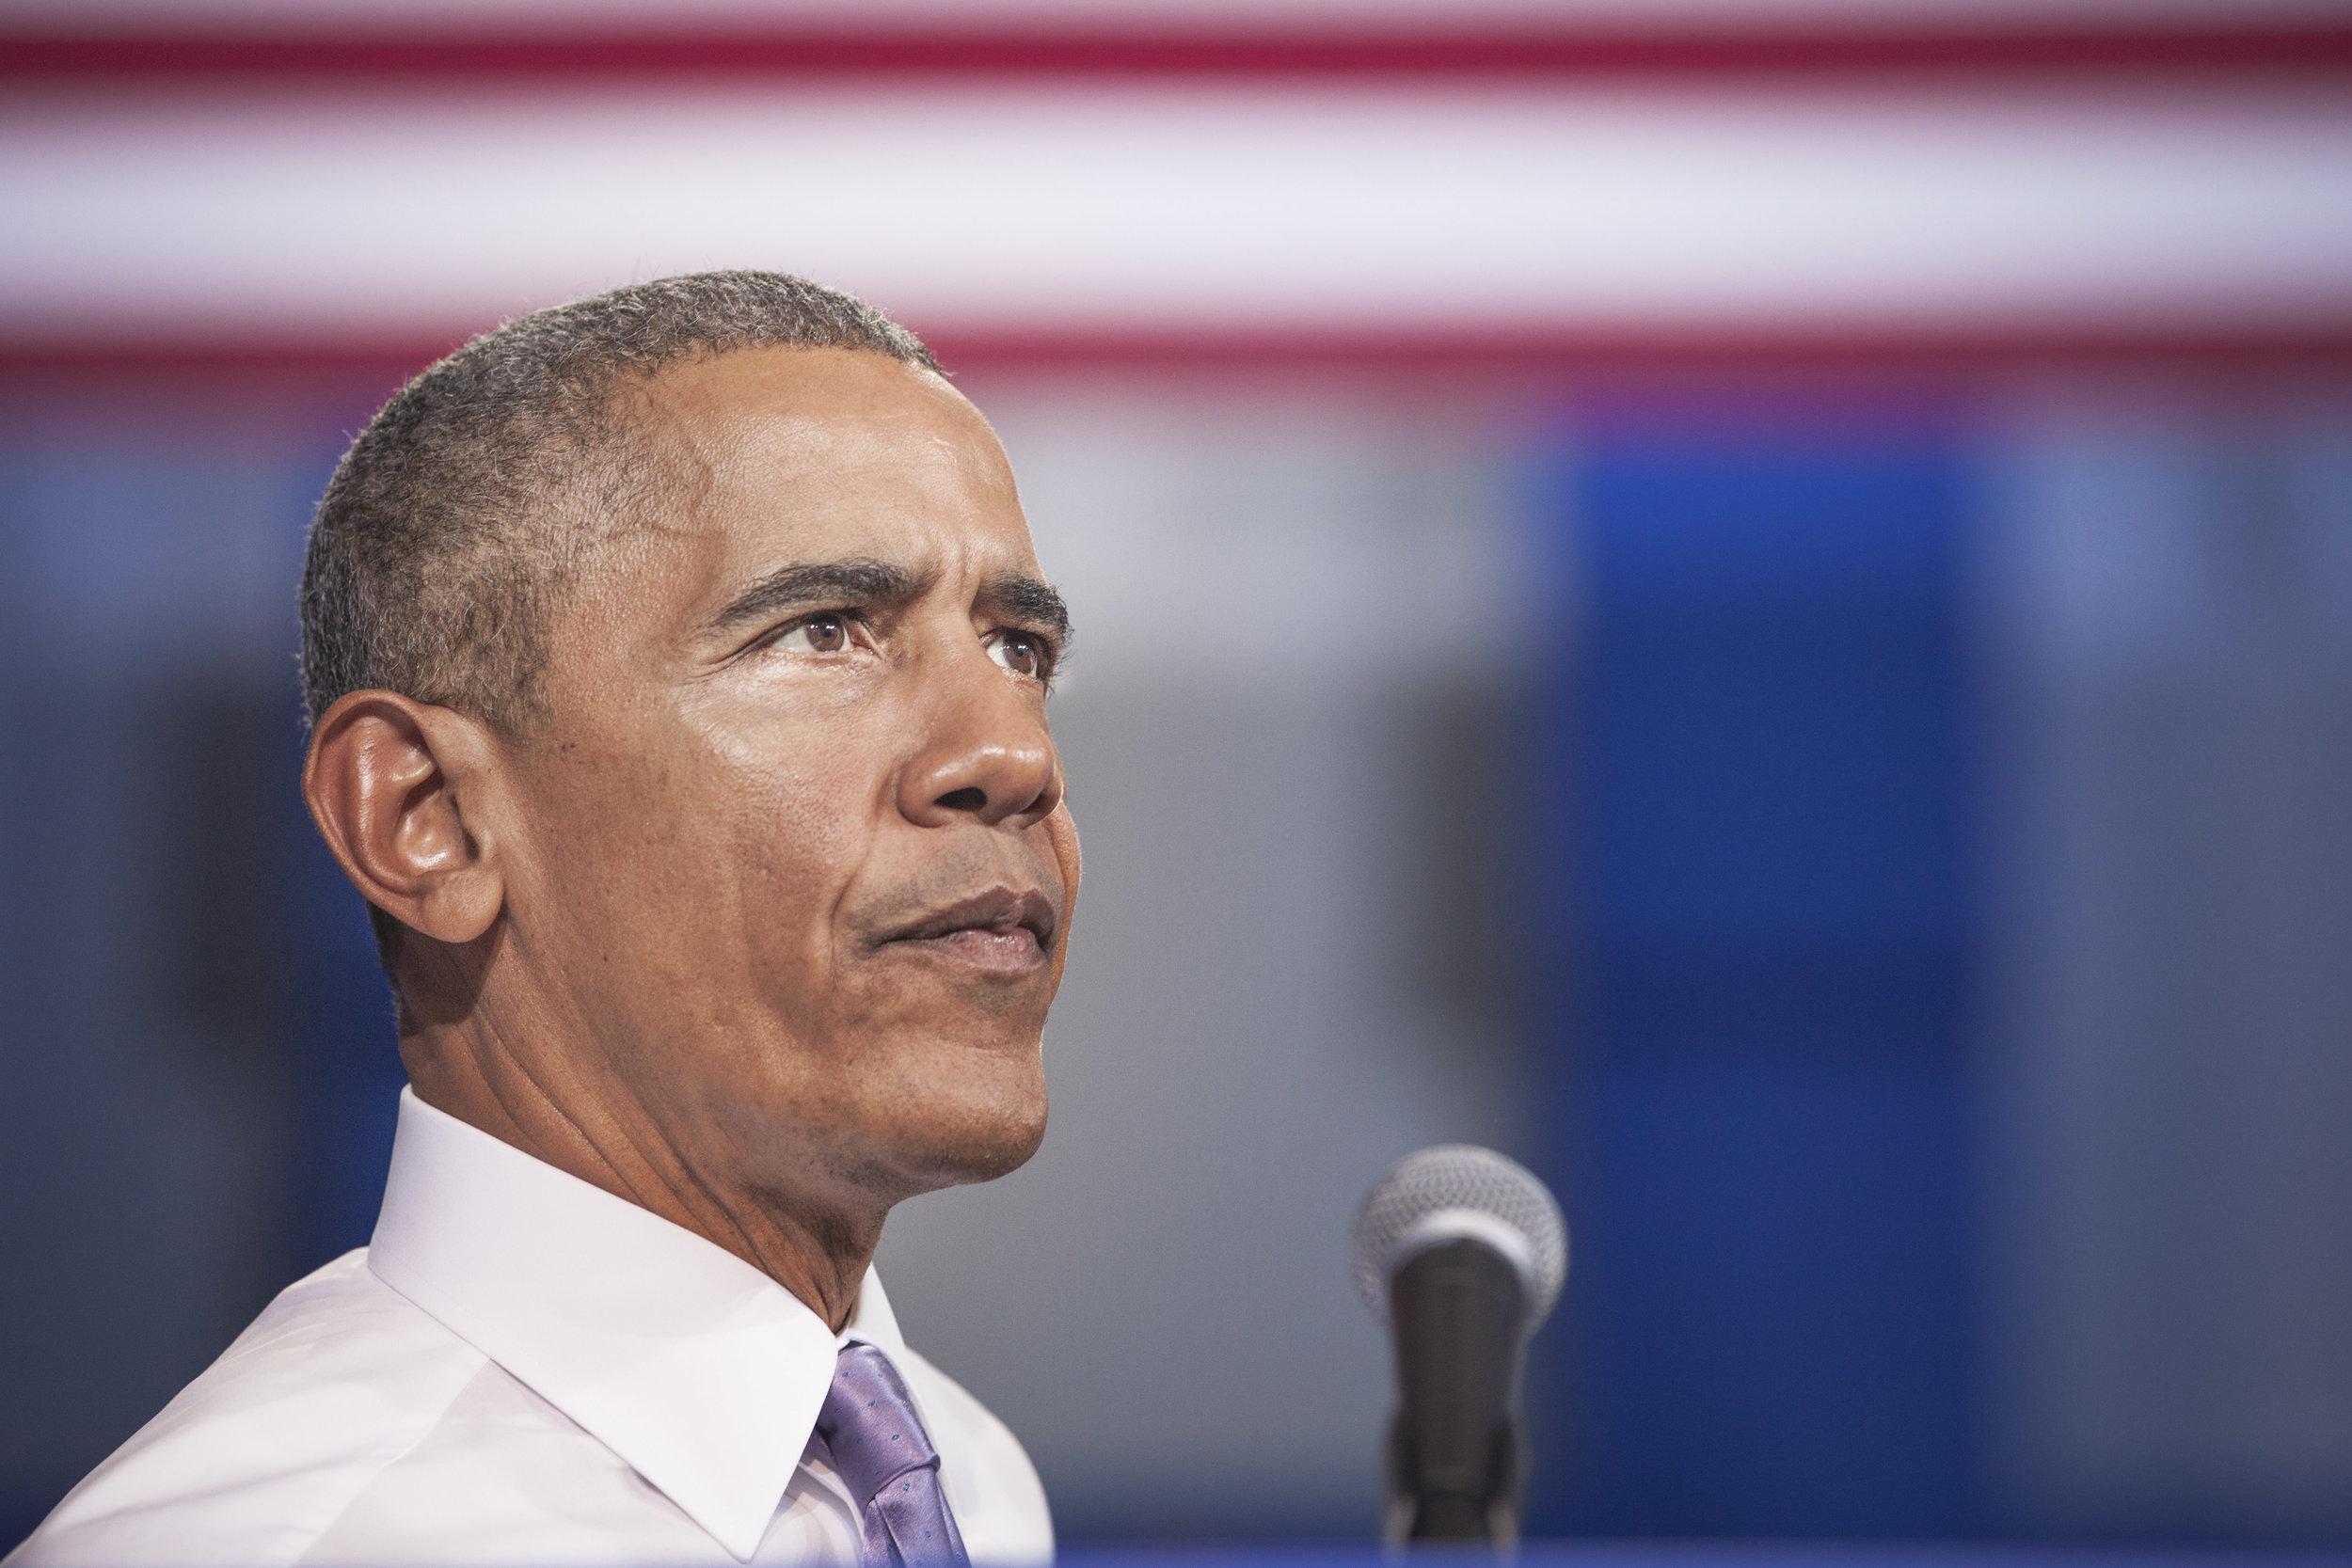 10202016_BJM_Barack_Obama_Campaigns_in_Miami_Florida_14.jpg